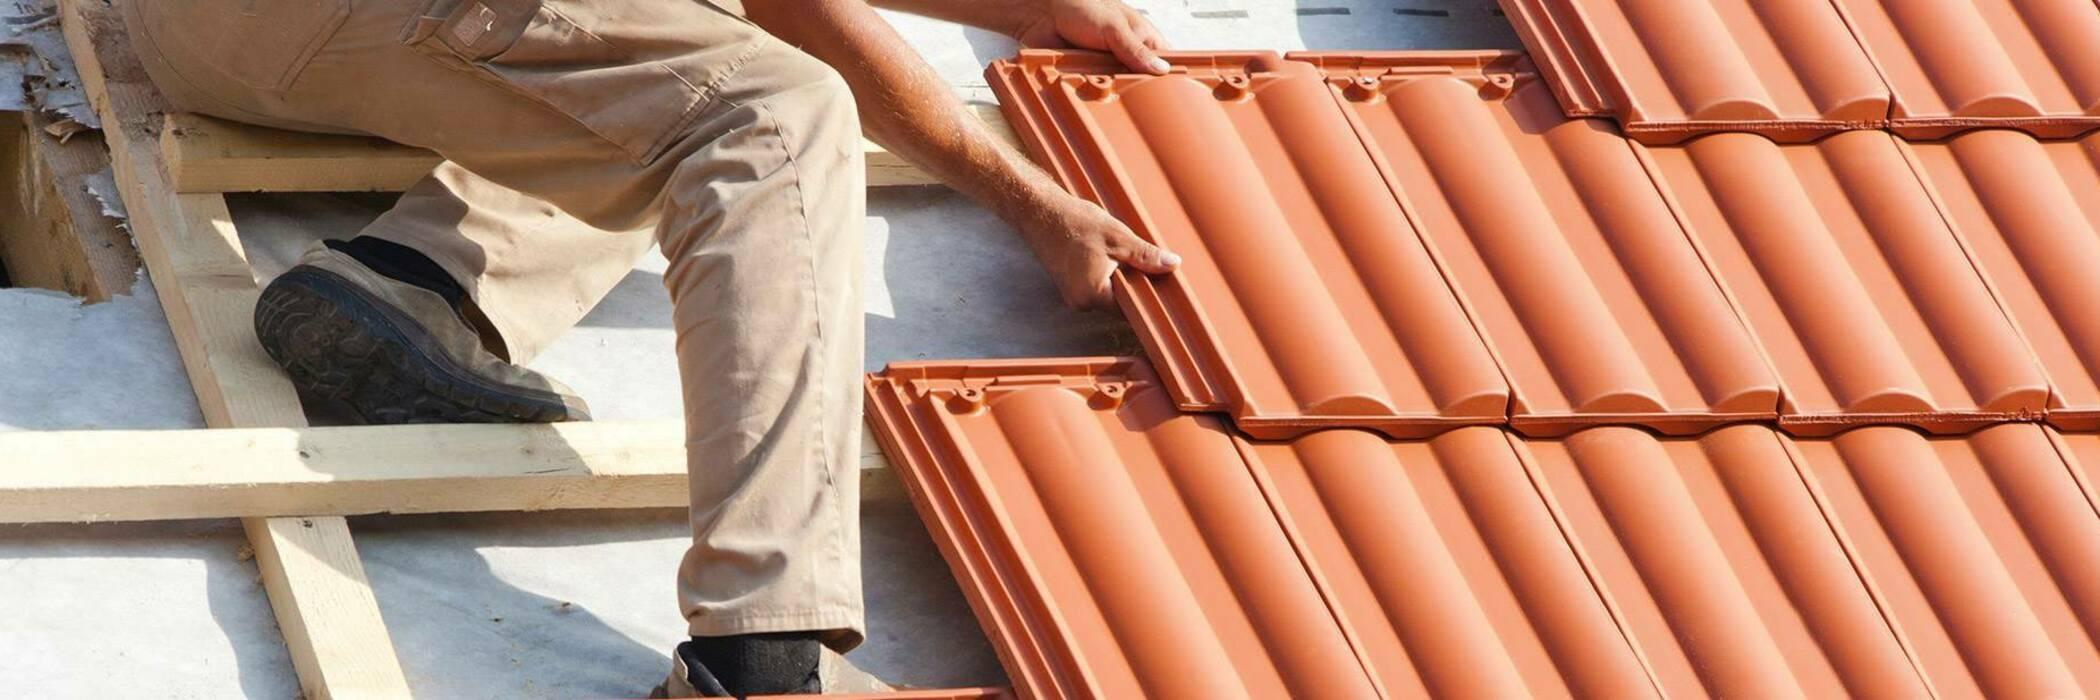 Tile roofs hero